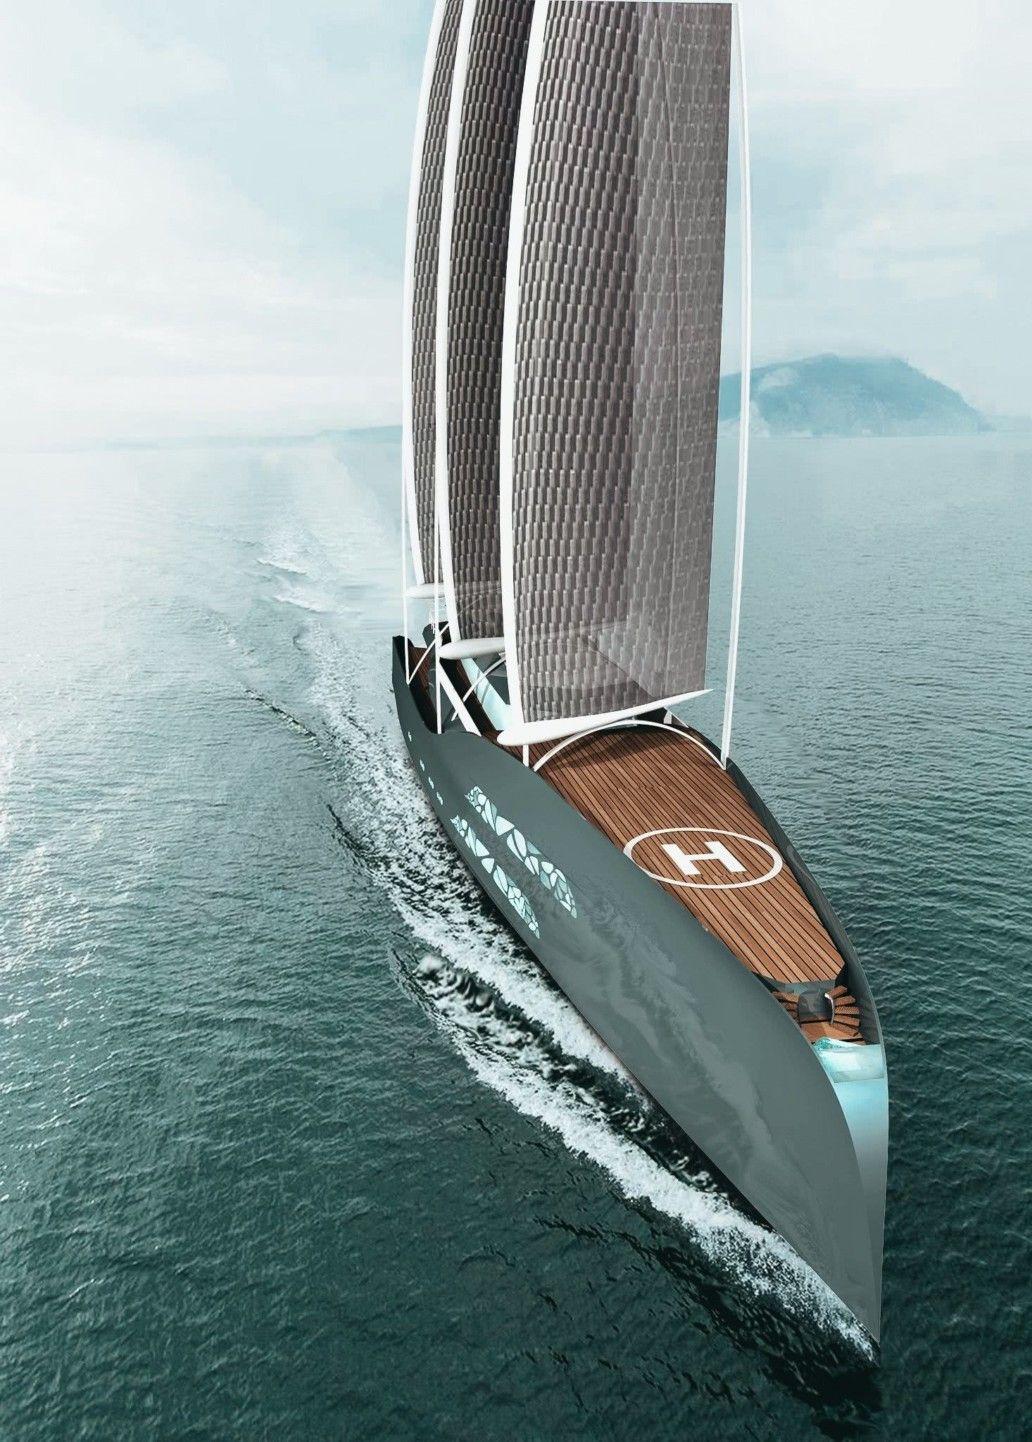 Crystal Glacies - a 84m Sail-Assisted Yacht by Matej Pinkos #yacht #superyacht #megayacht #luxury #luxuryyacht #yachts #superyachts #megayachts #yachtdesign #design #productdesign #industrialdesign #boat #boats #yate #yatch #jacht #yates